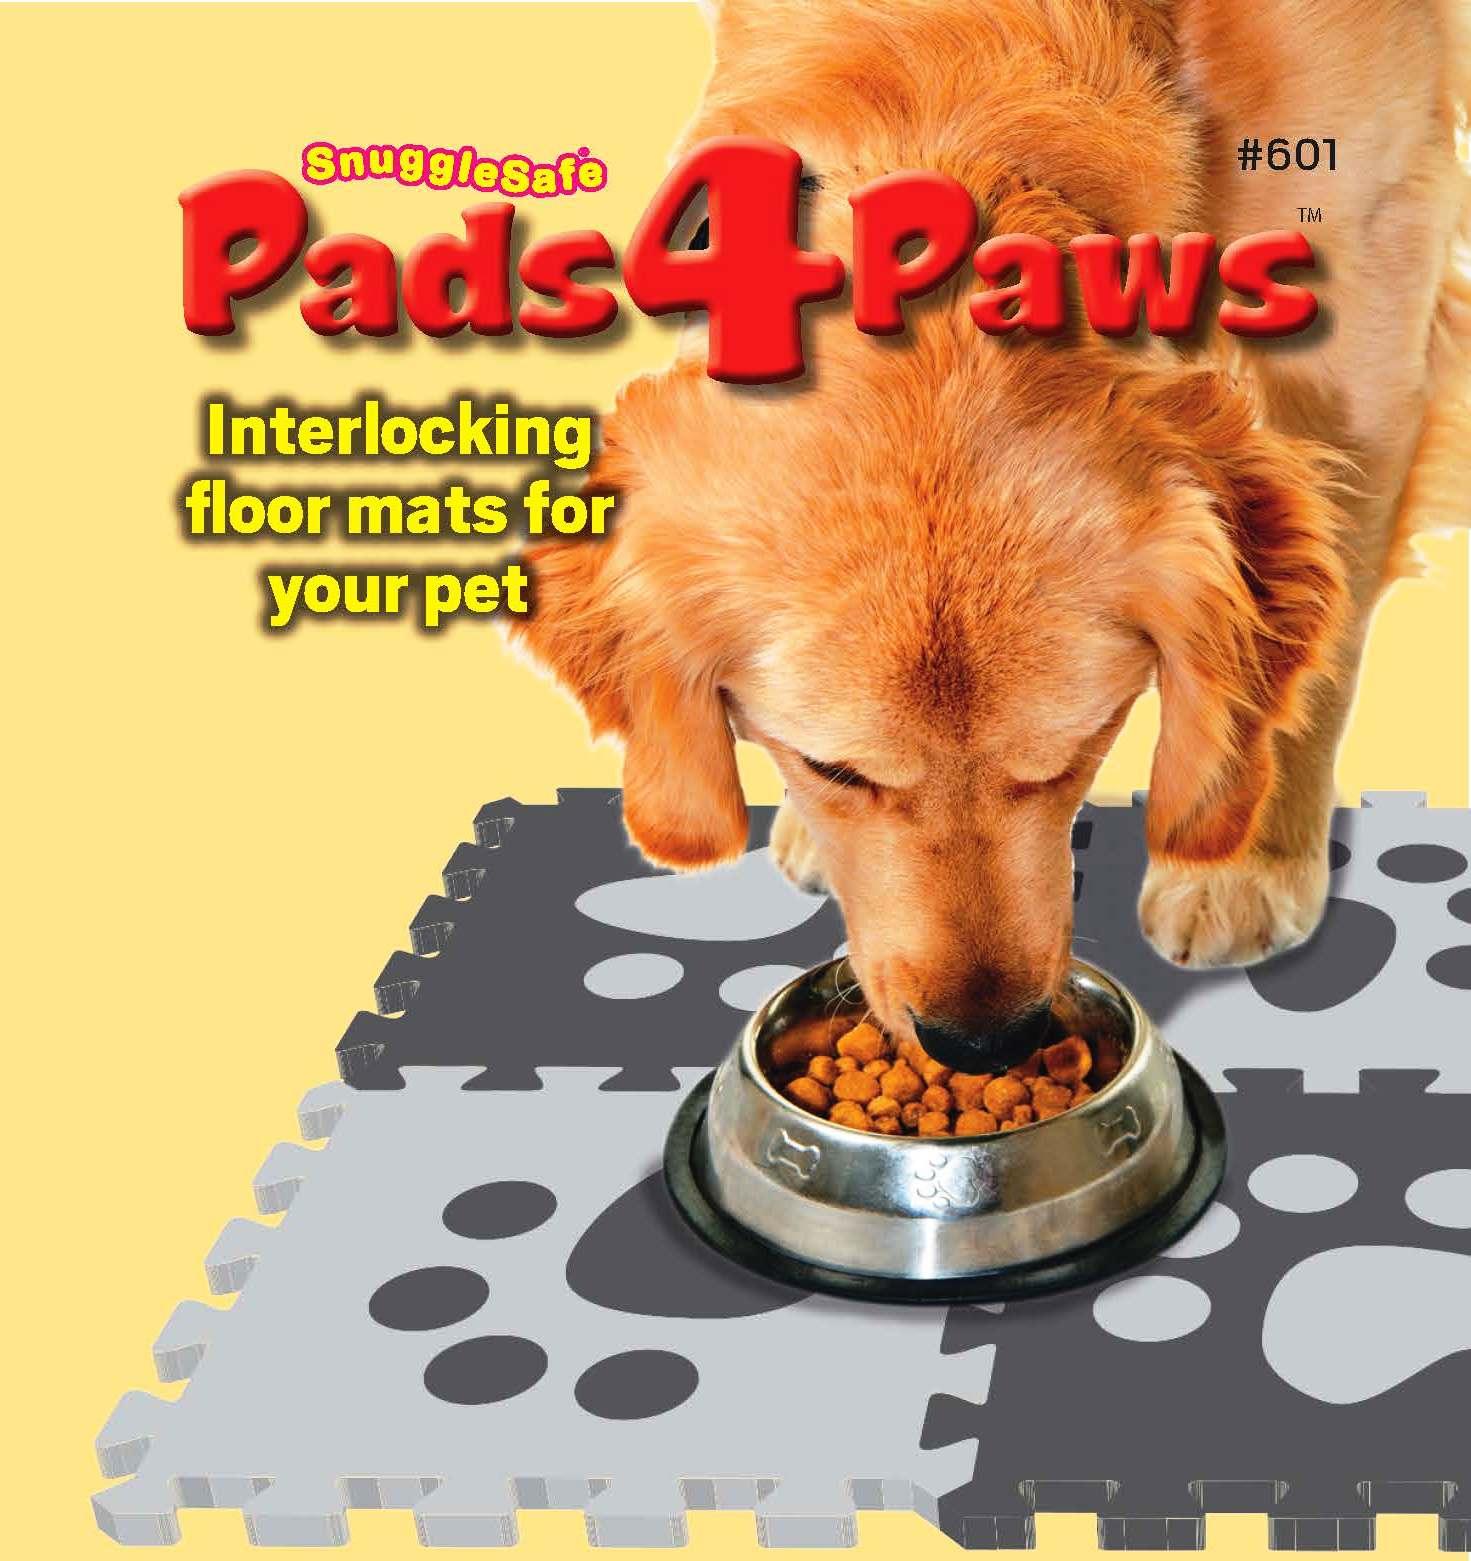 doormat print home cartoon sala slipetapetes casa modern dog in room anti mat fashion floors from head floor item para hallway children garden